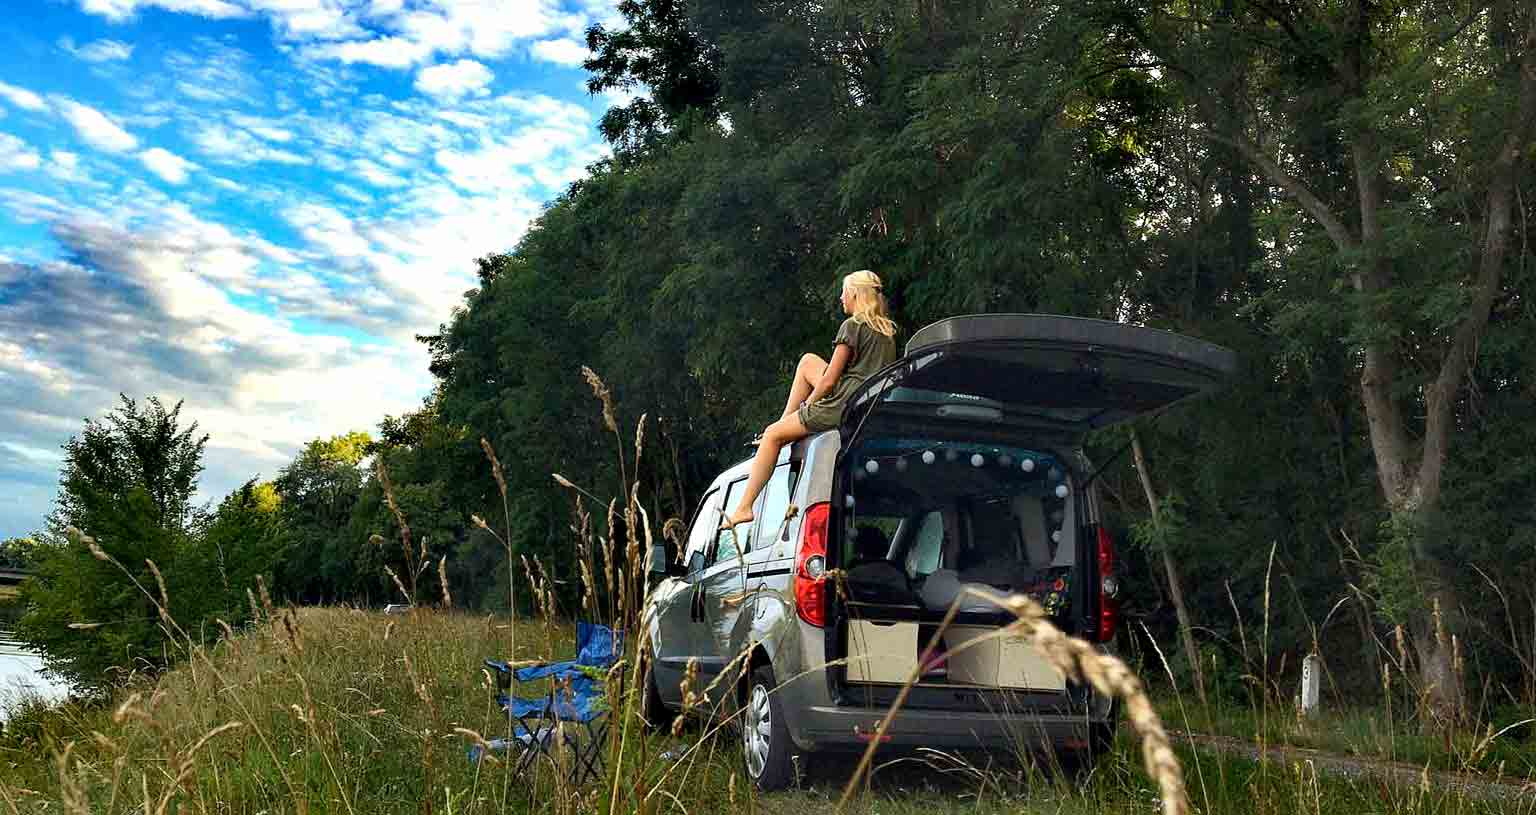 campingbox-hornbach-reimo-camperausbau-modulare-loesung